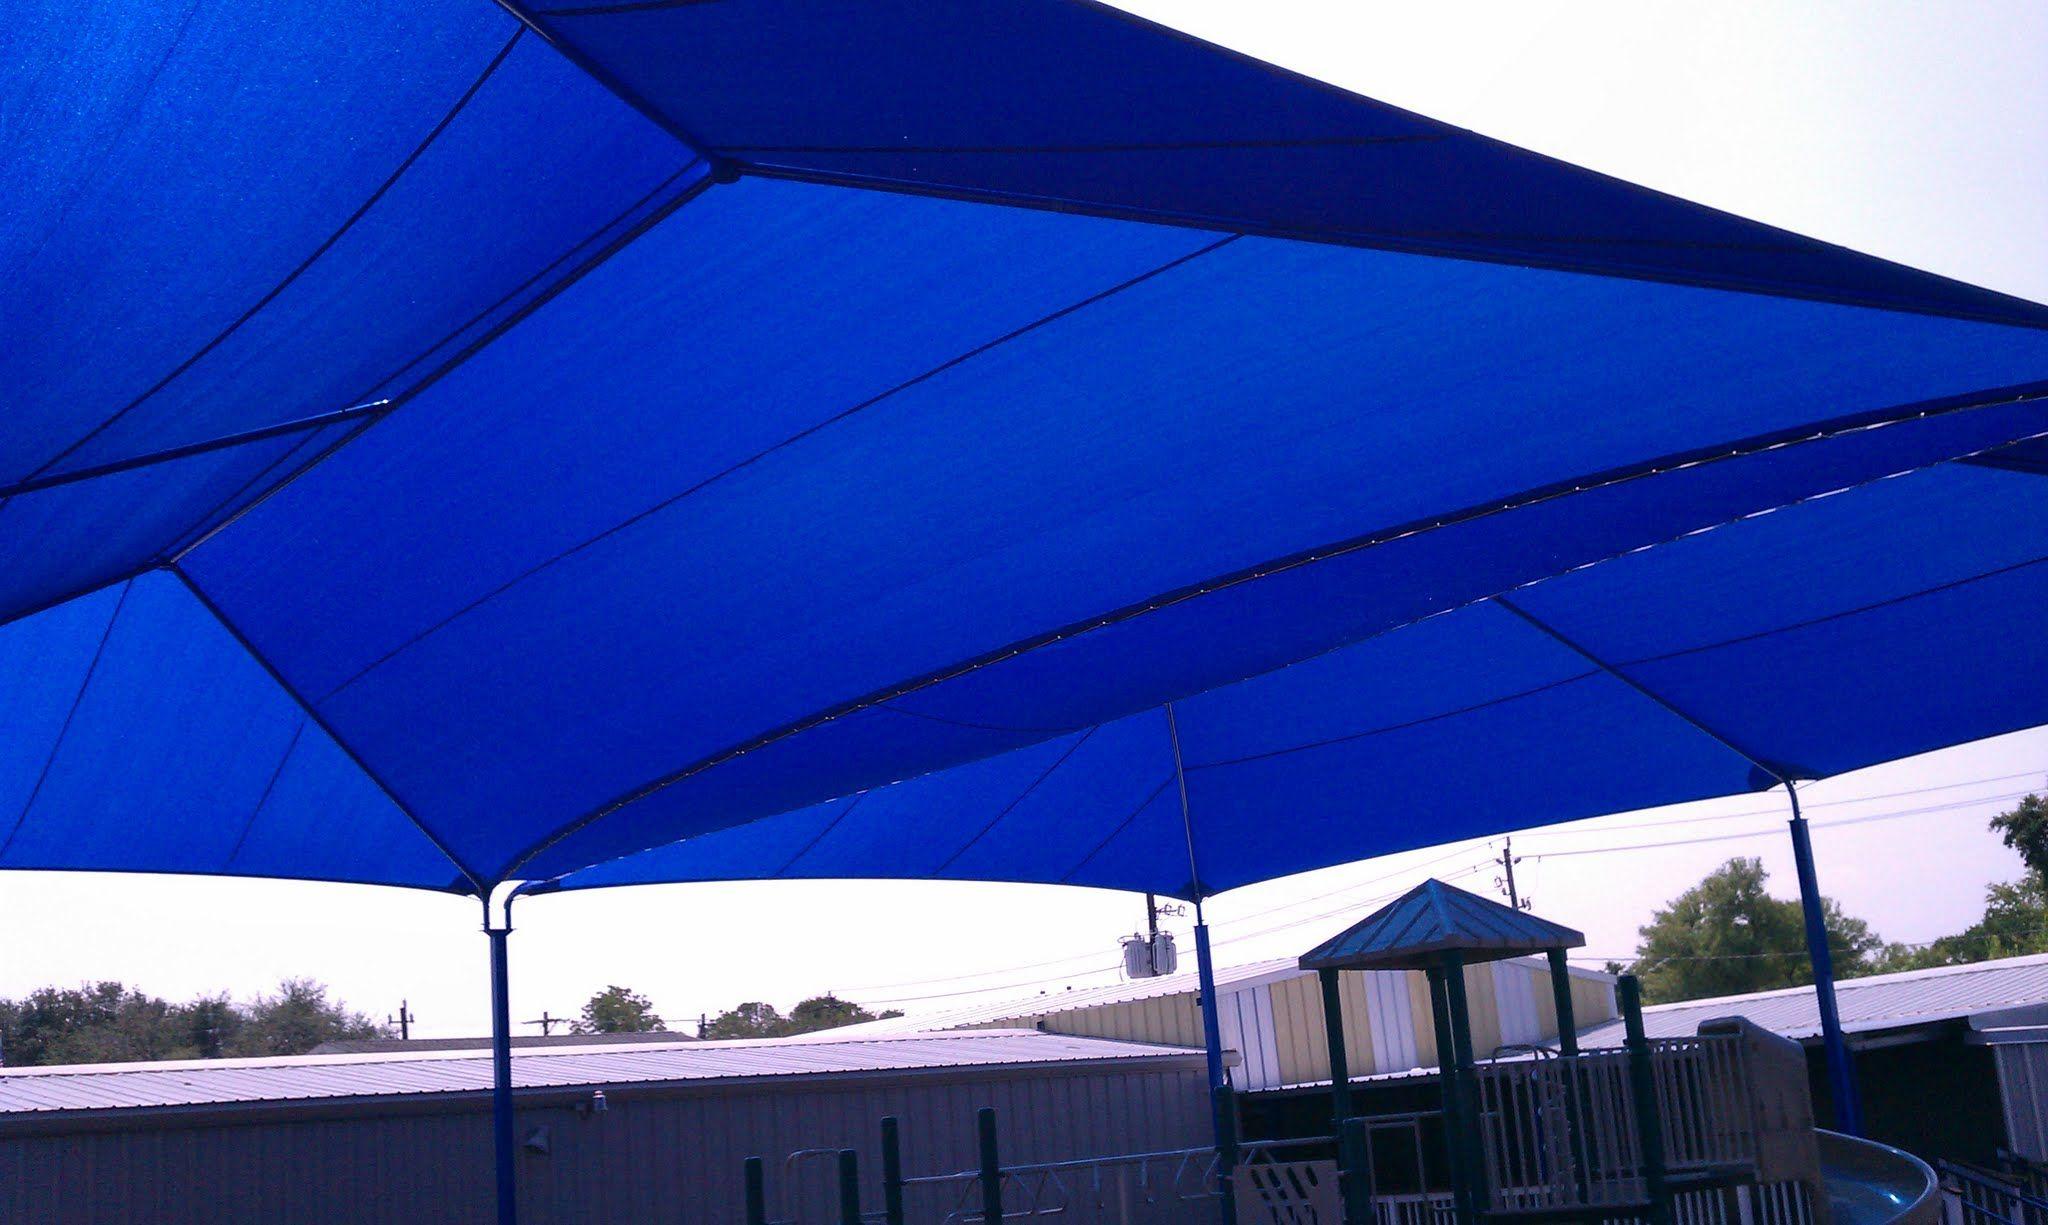 Rectangular Shade 62x55 from DunRite Playgrounds. http://www.dunriteplaygrounds.com